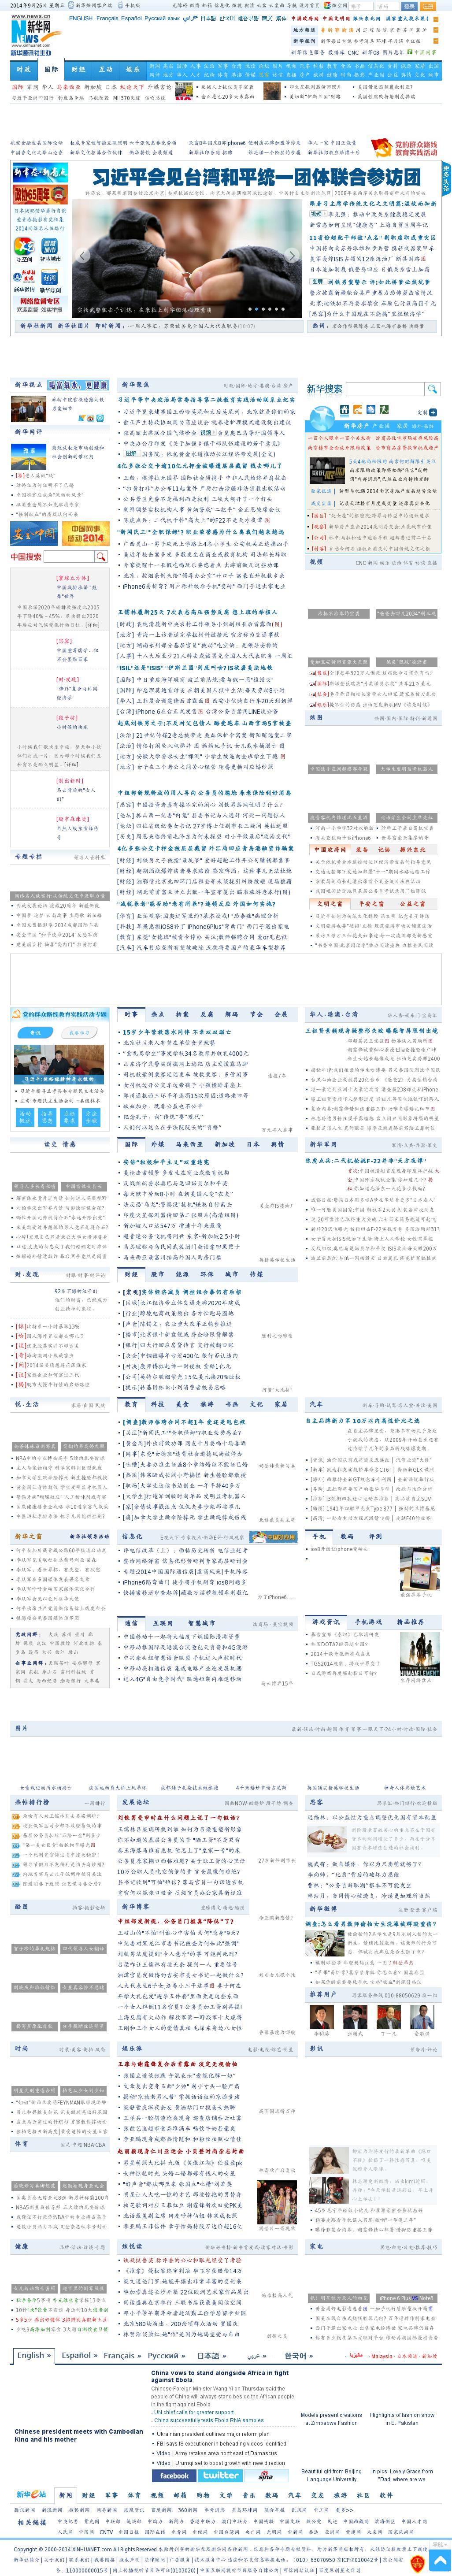 Xinhua at Friday Sept. 26, 2014, 2:26 a.m. UTC